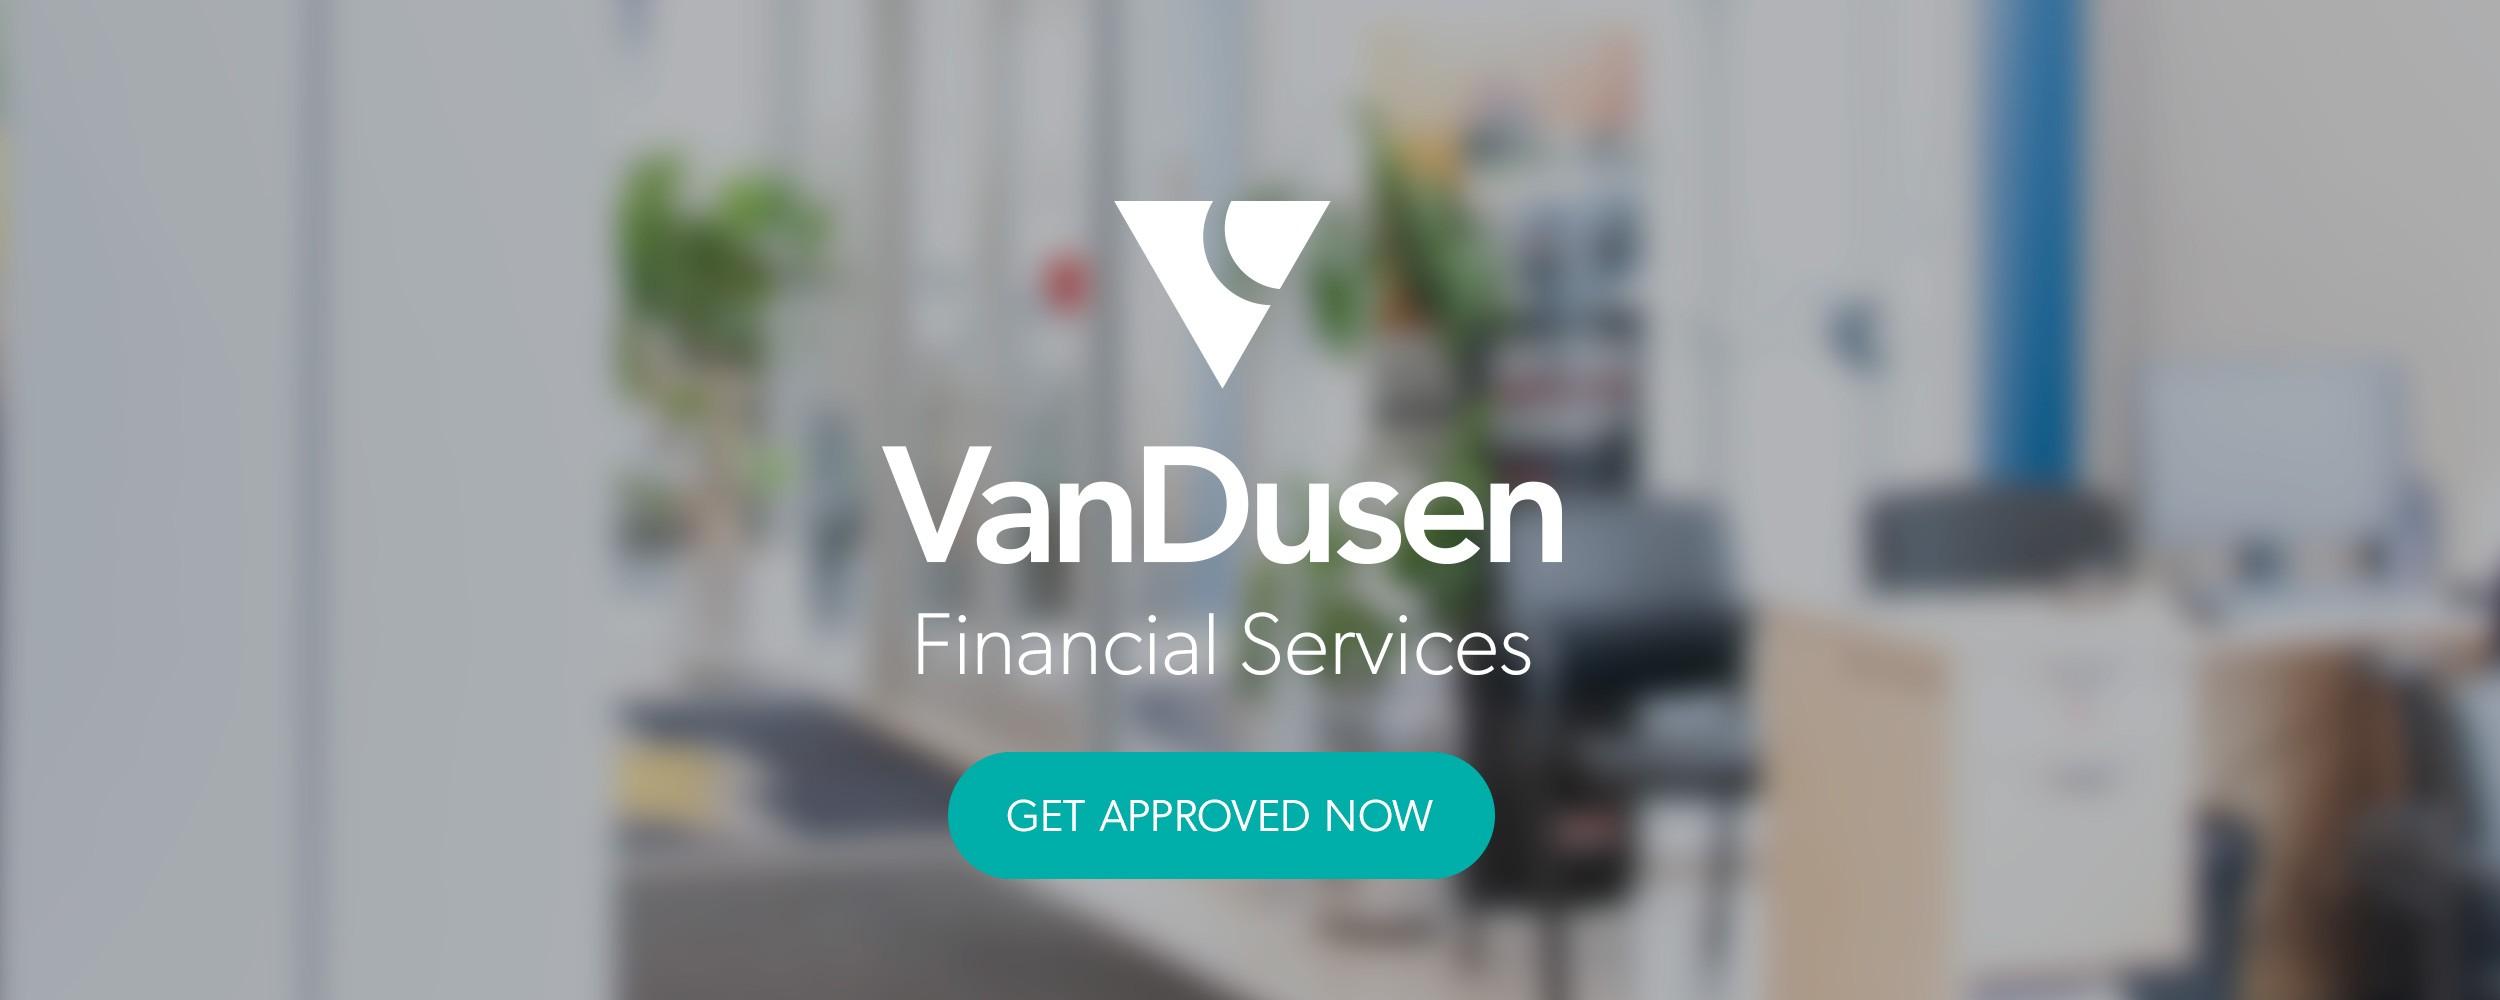 VanDusen Financial Services